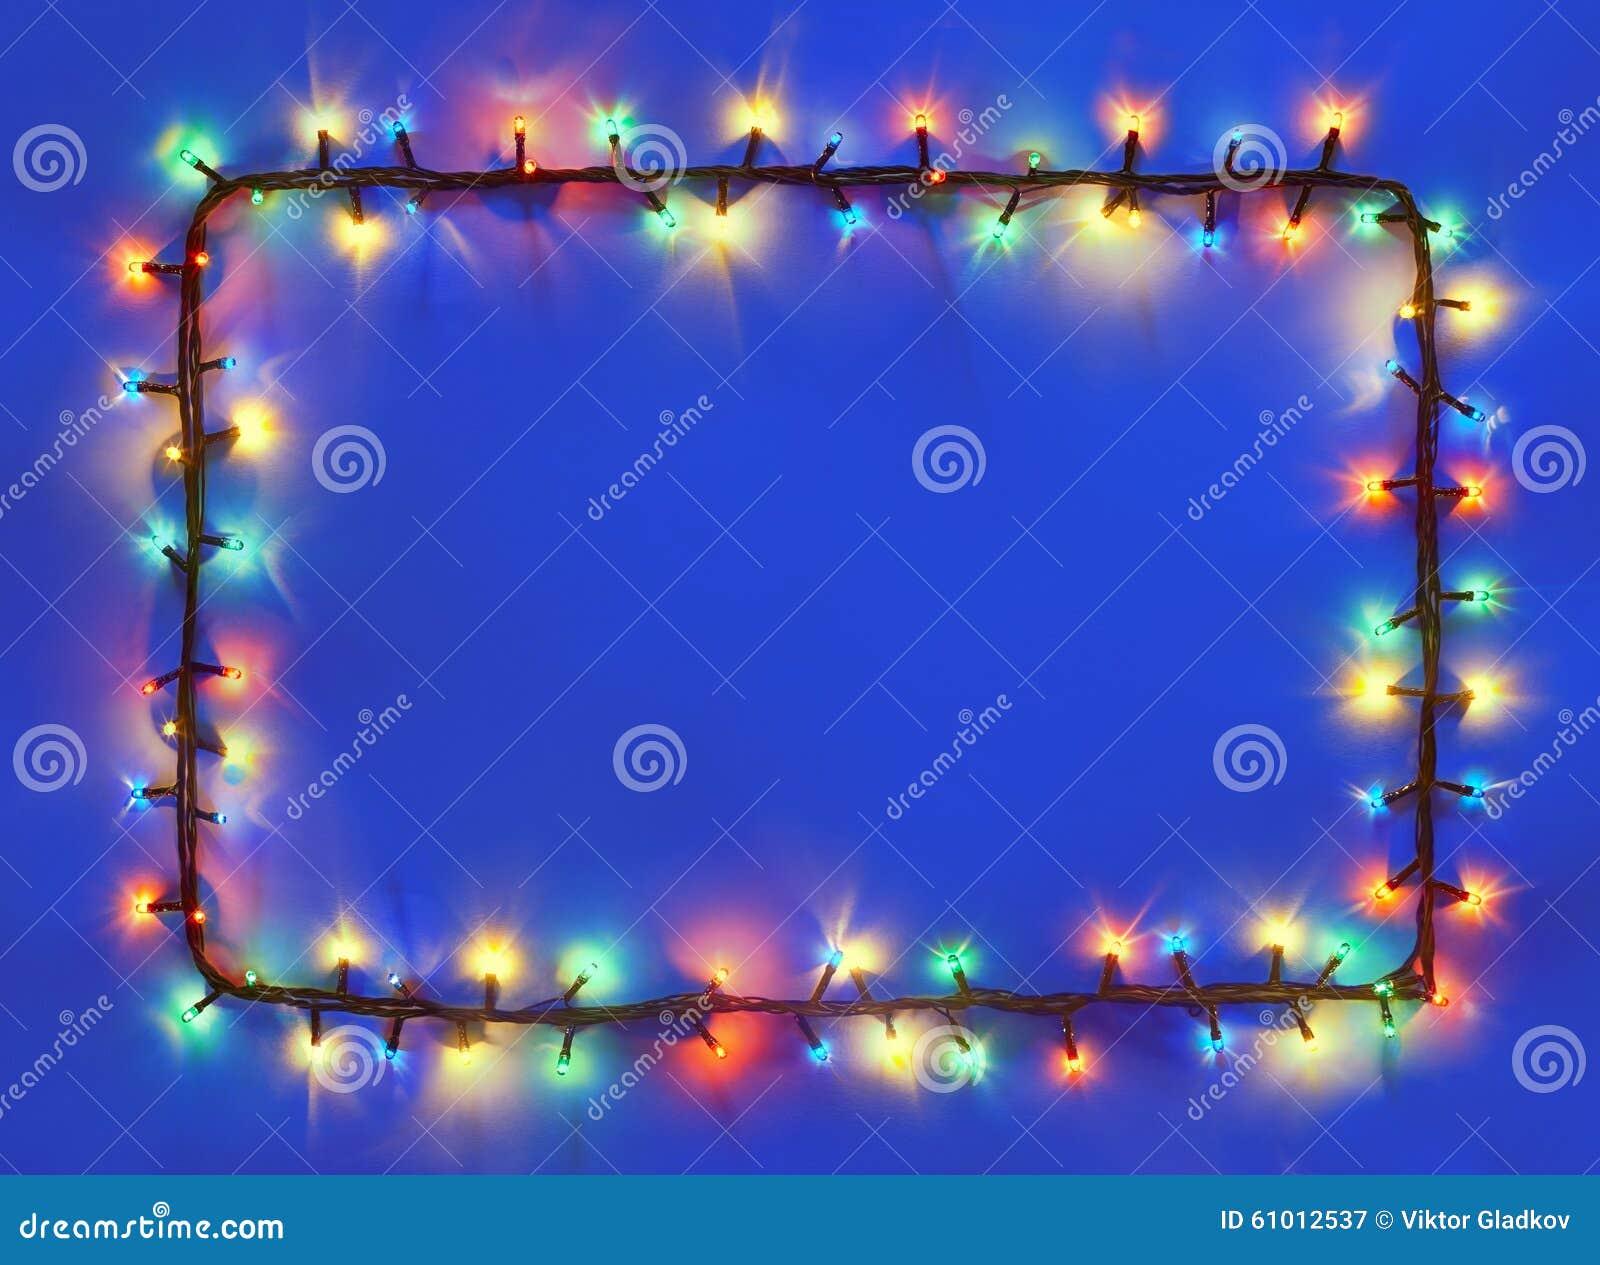 Christmas lights frame on dark blue background